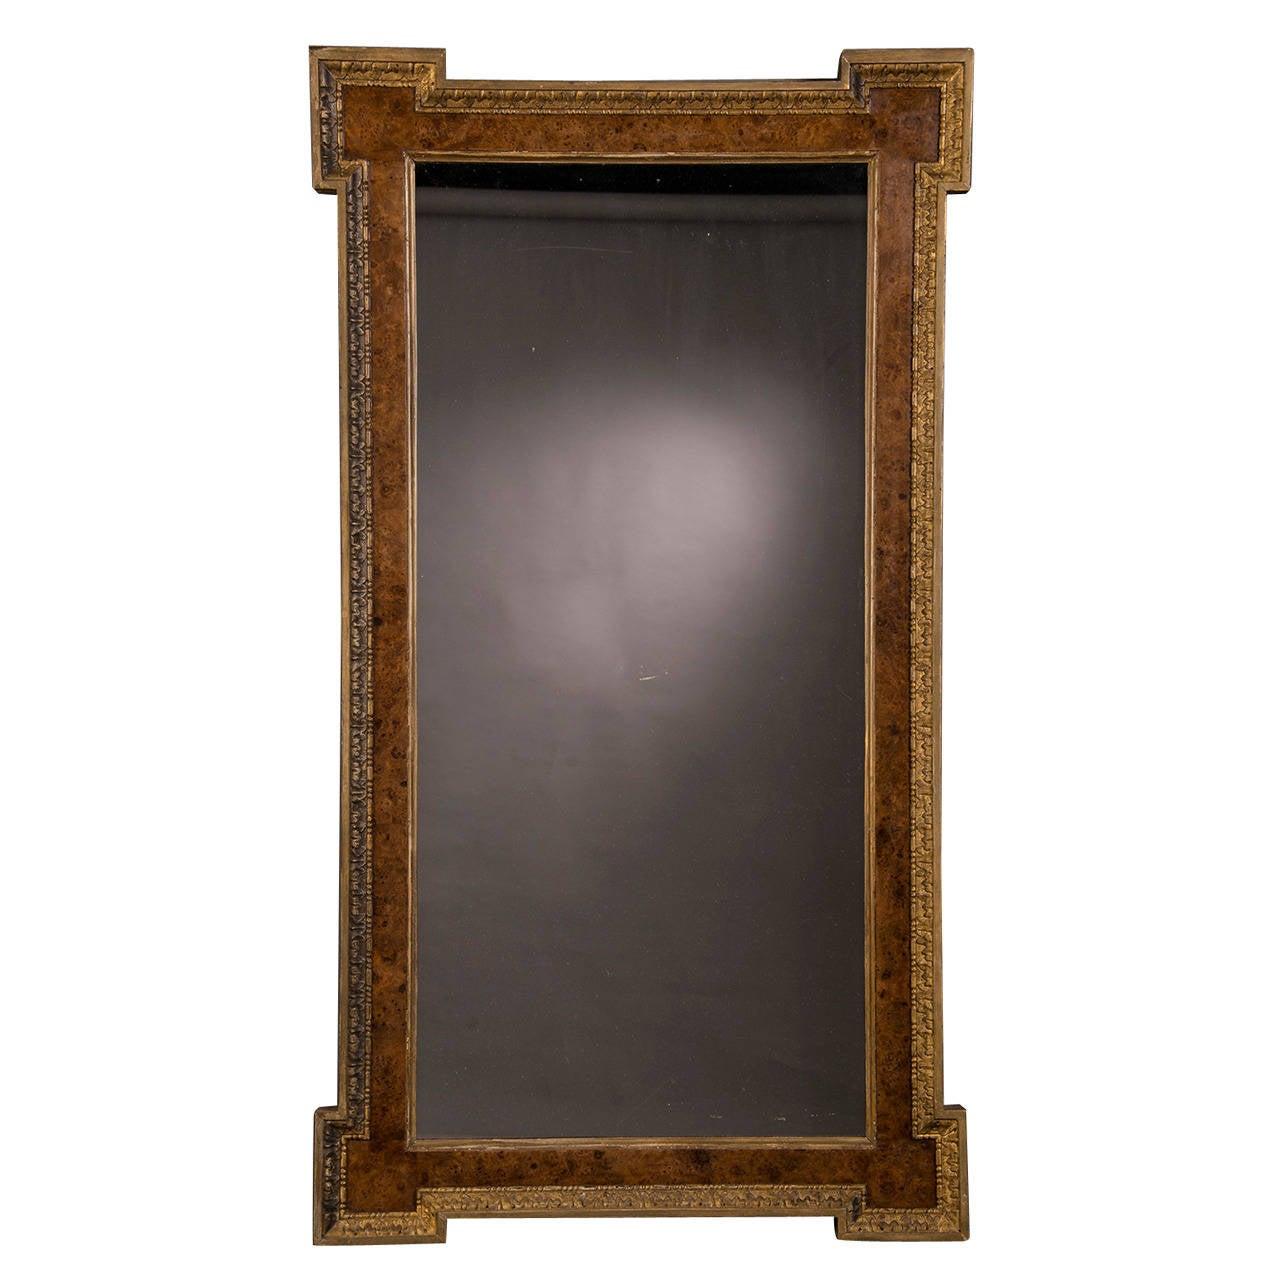 "William Kent Burl Elm and Gilded Mirror, England circa 1875 (43""w x 61 1/2""h)"